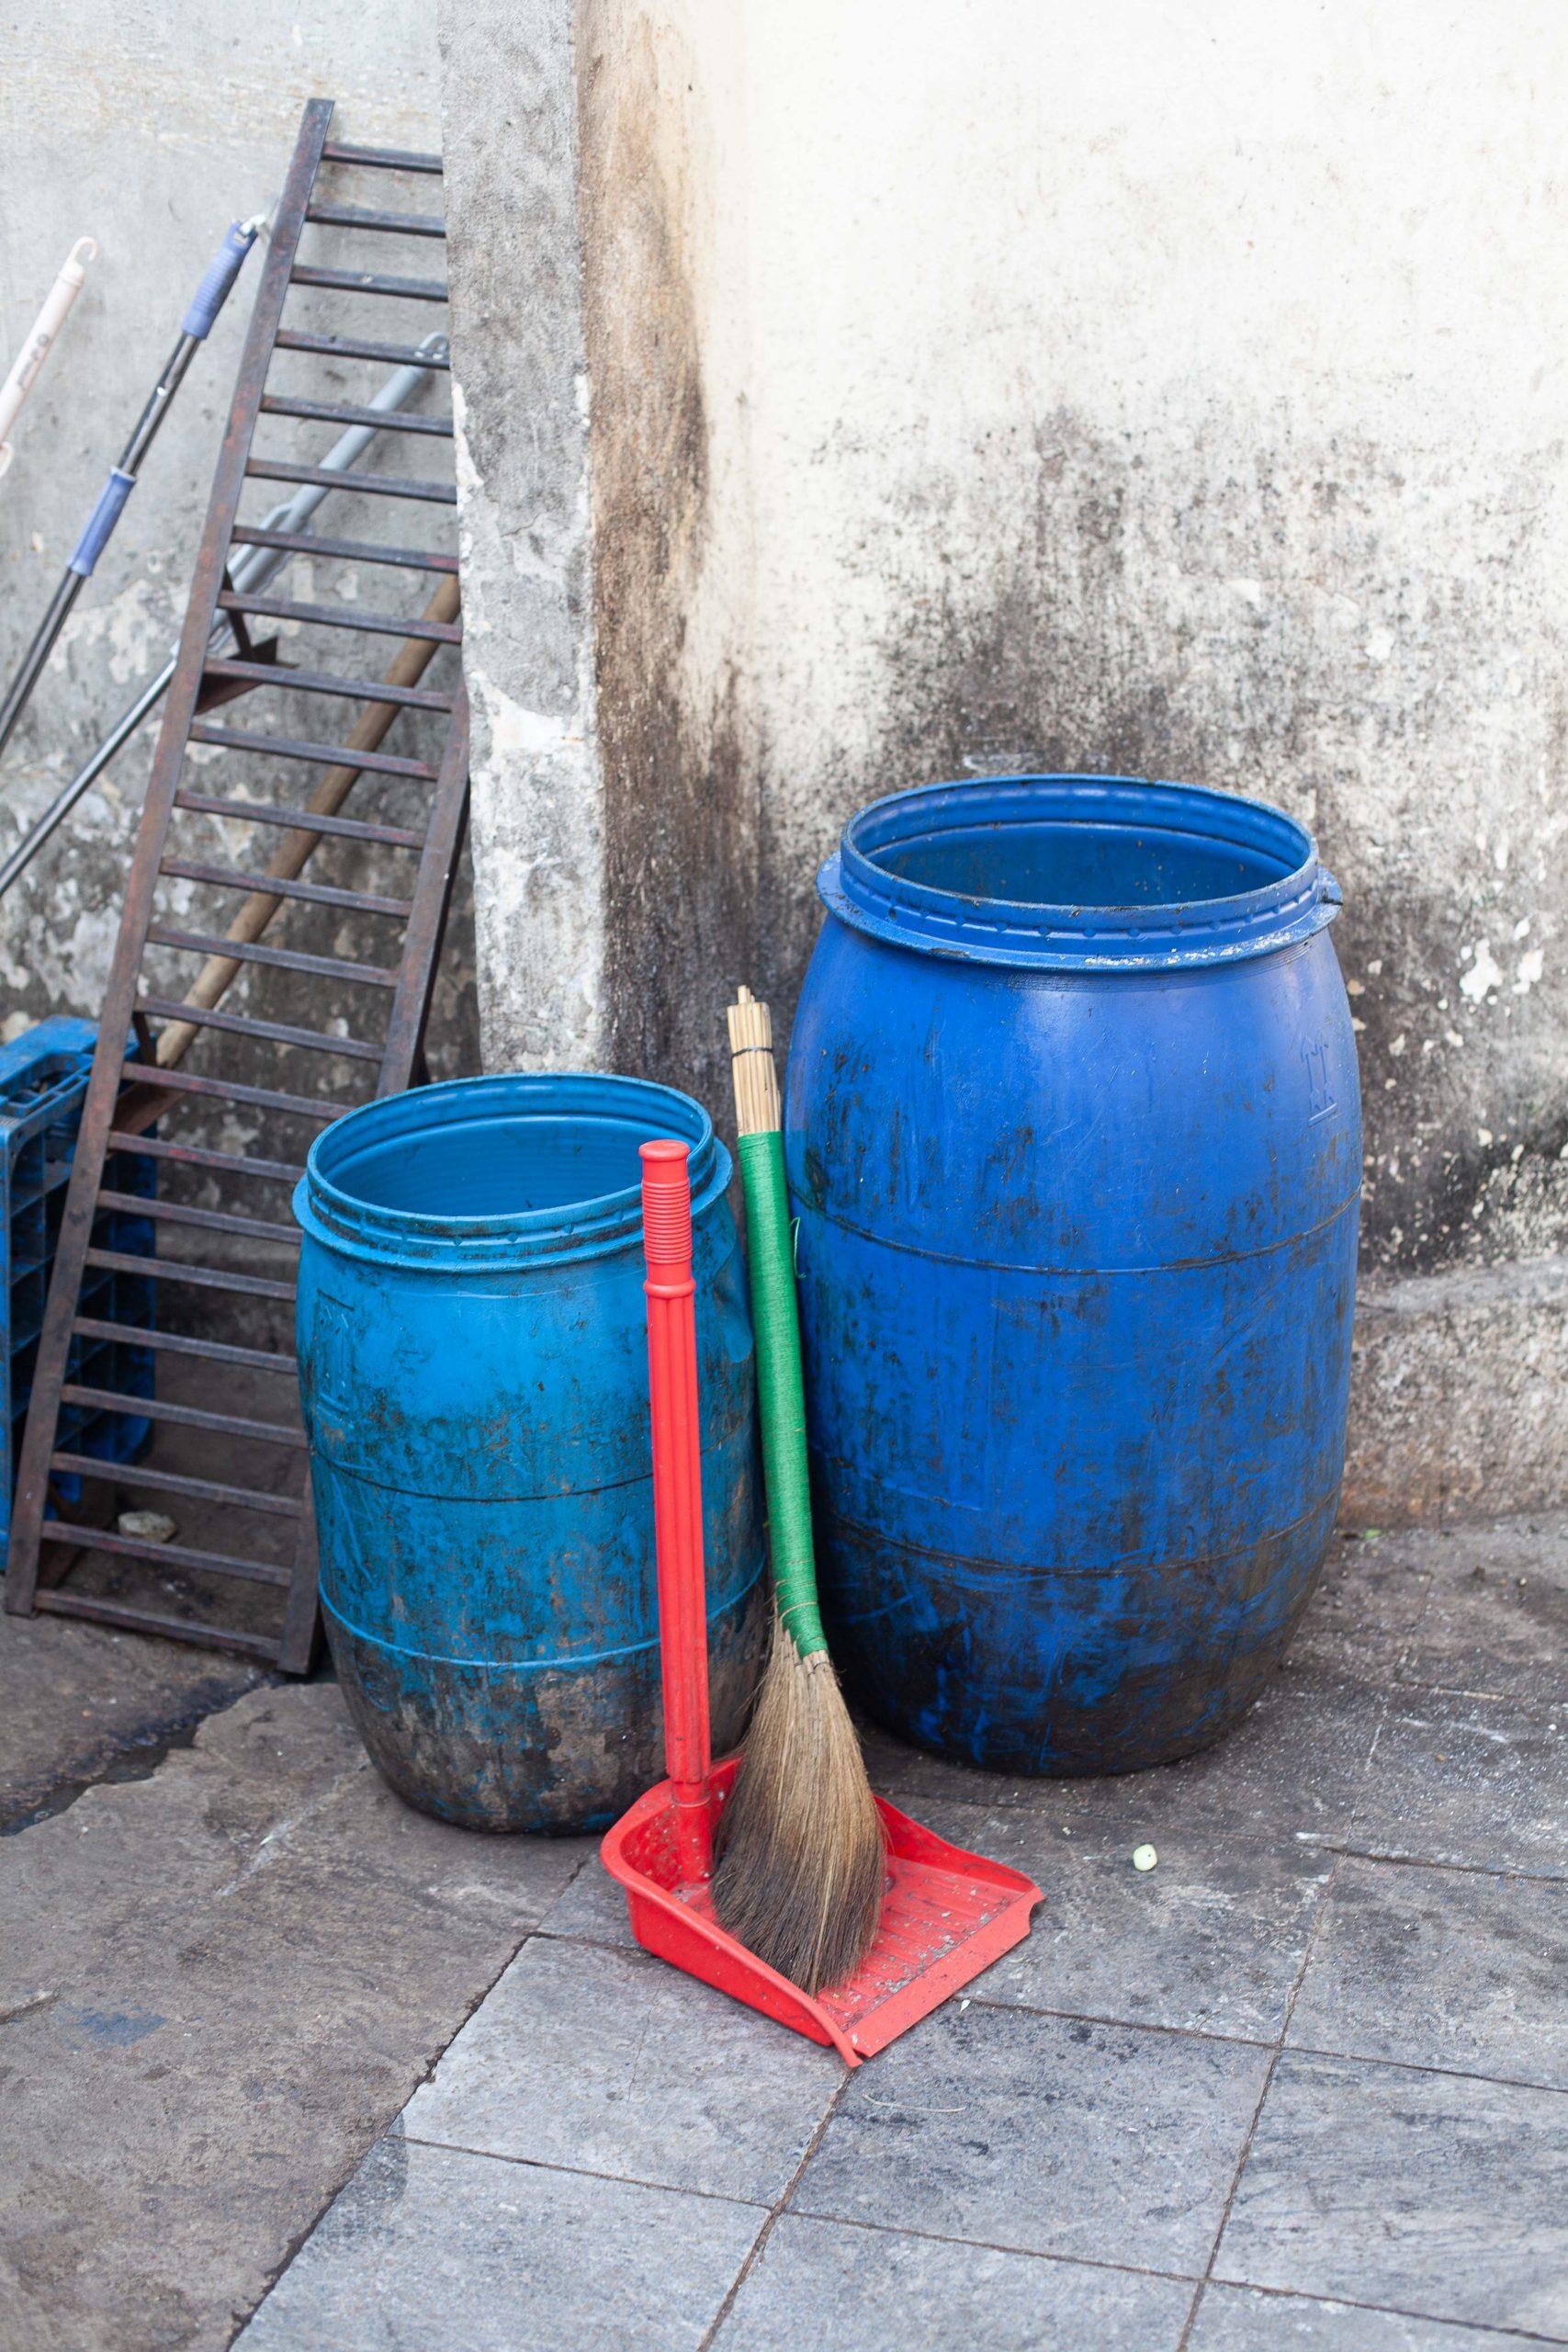 Broomstick-compositions-vietnam-19-of-40